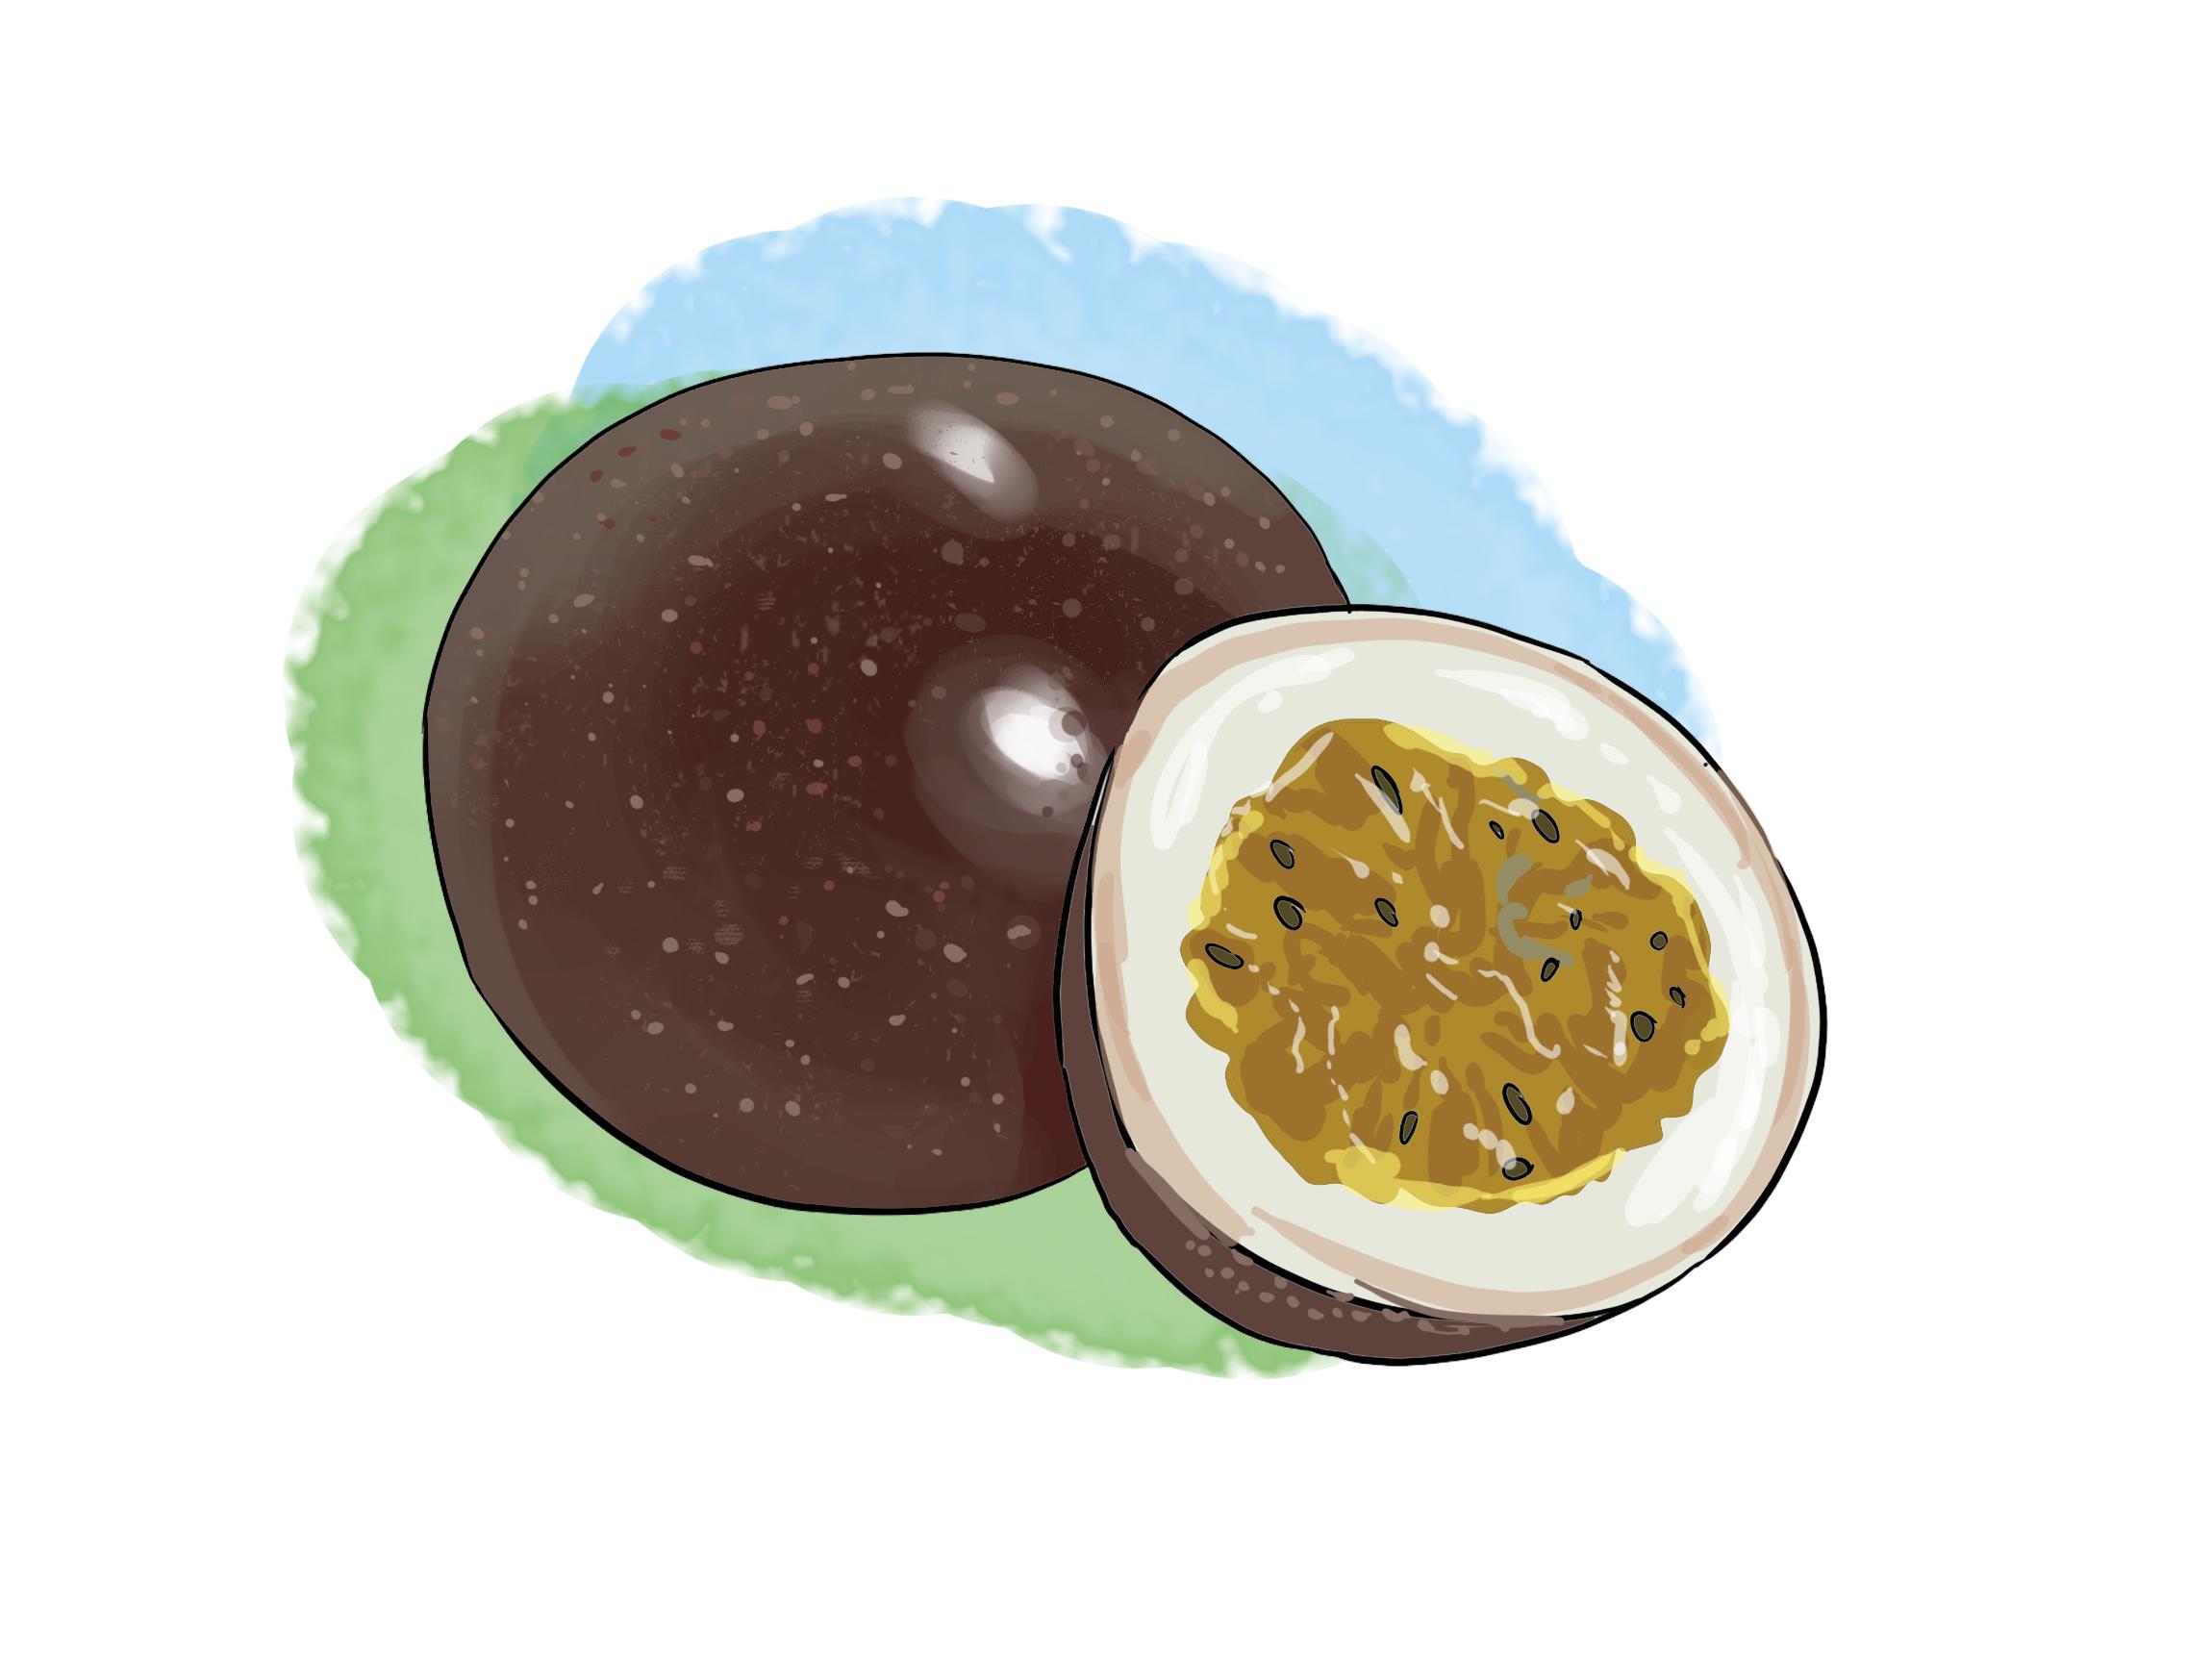 Grenadille cliparts gratuis - Fruits images